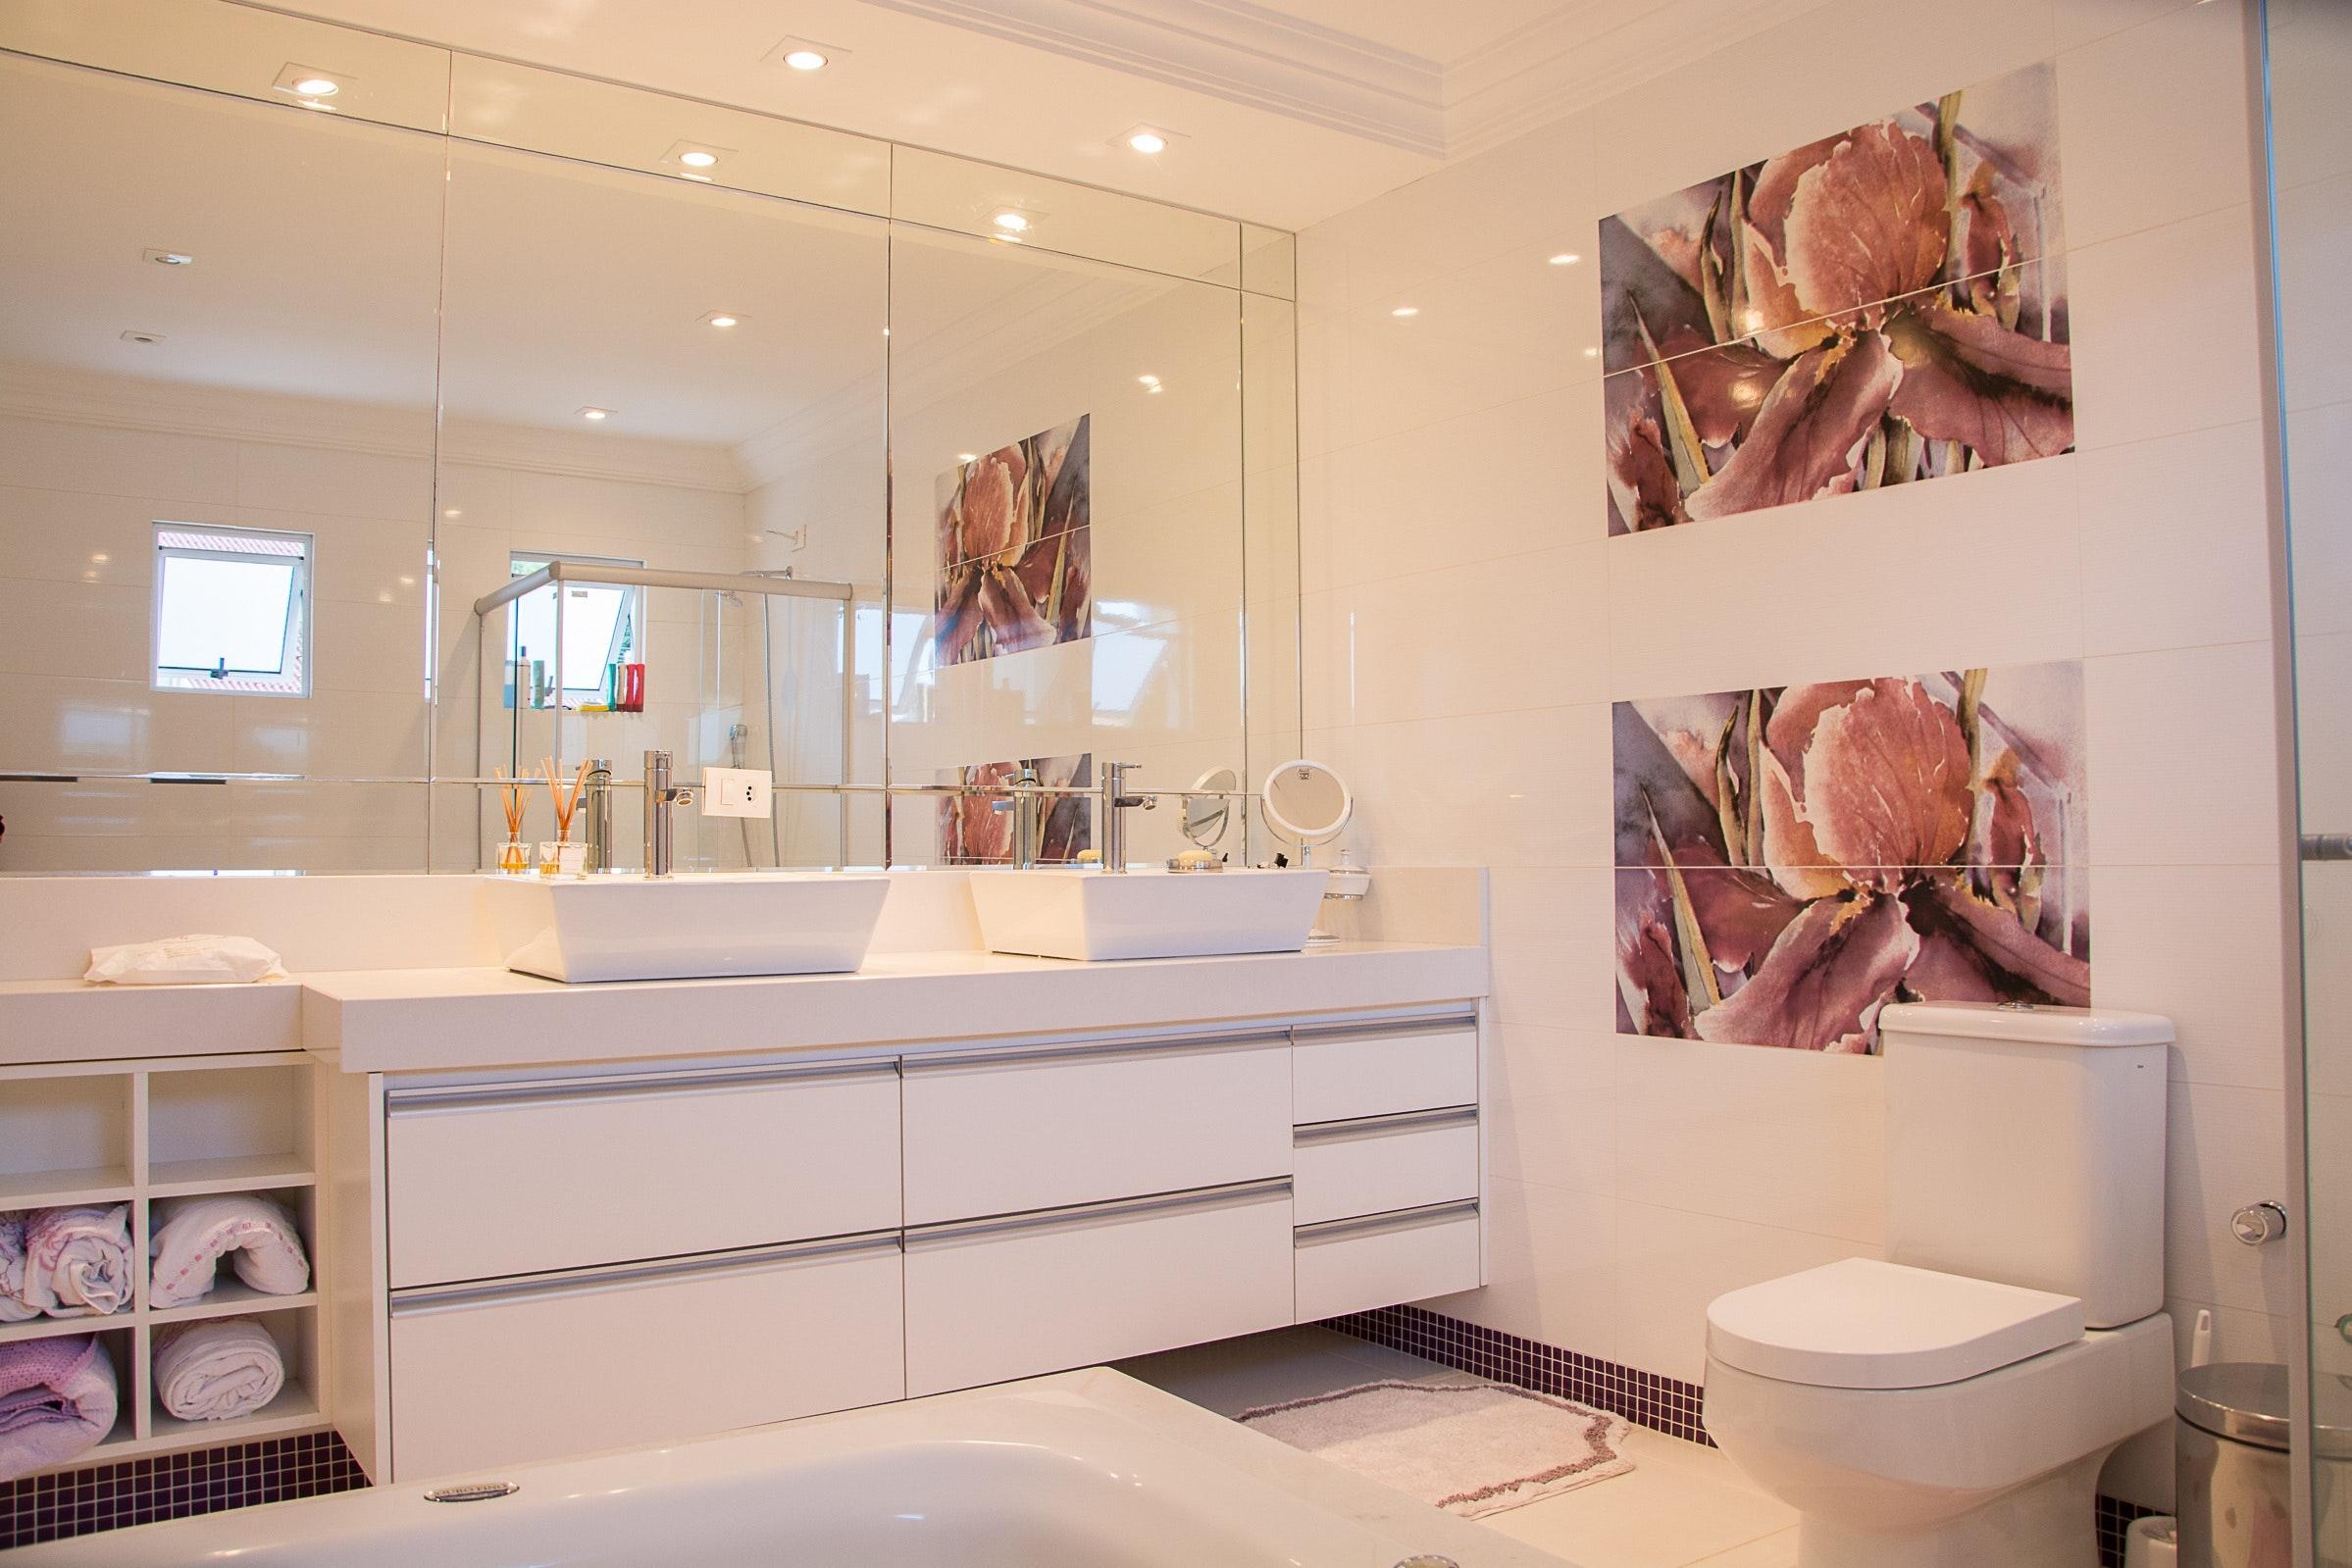 architecture-bathroom-contemporary-280209.jpg